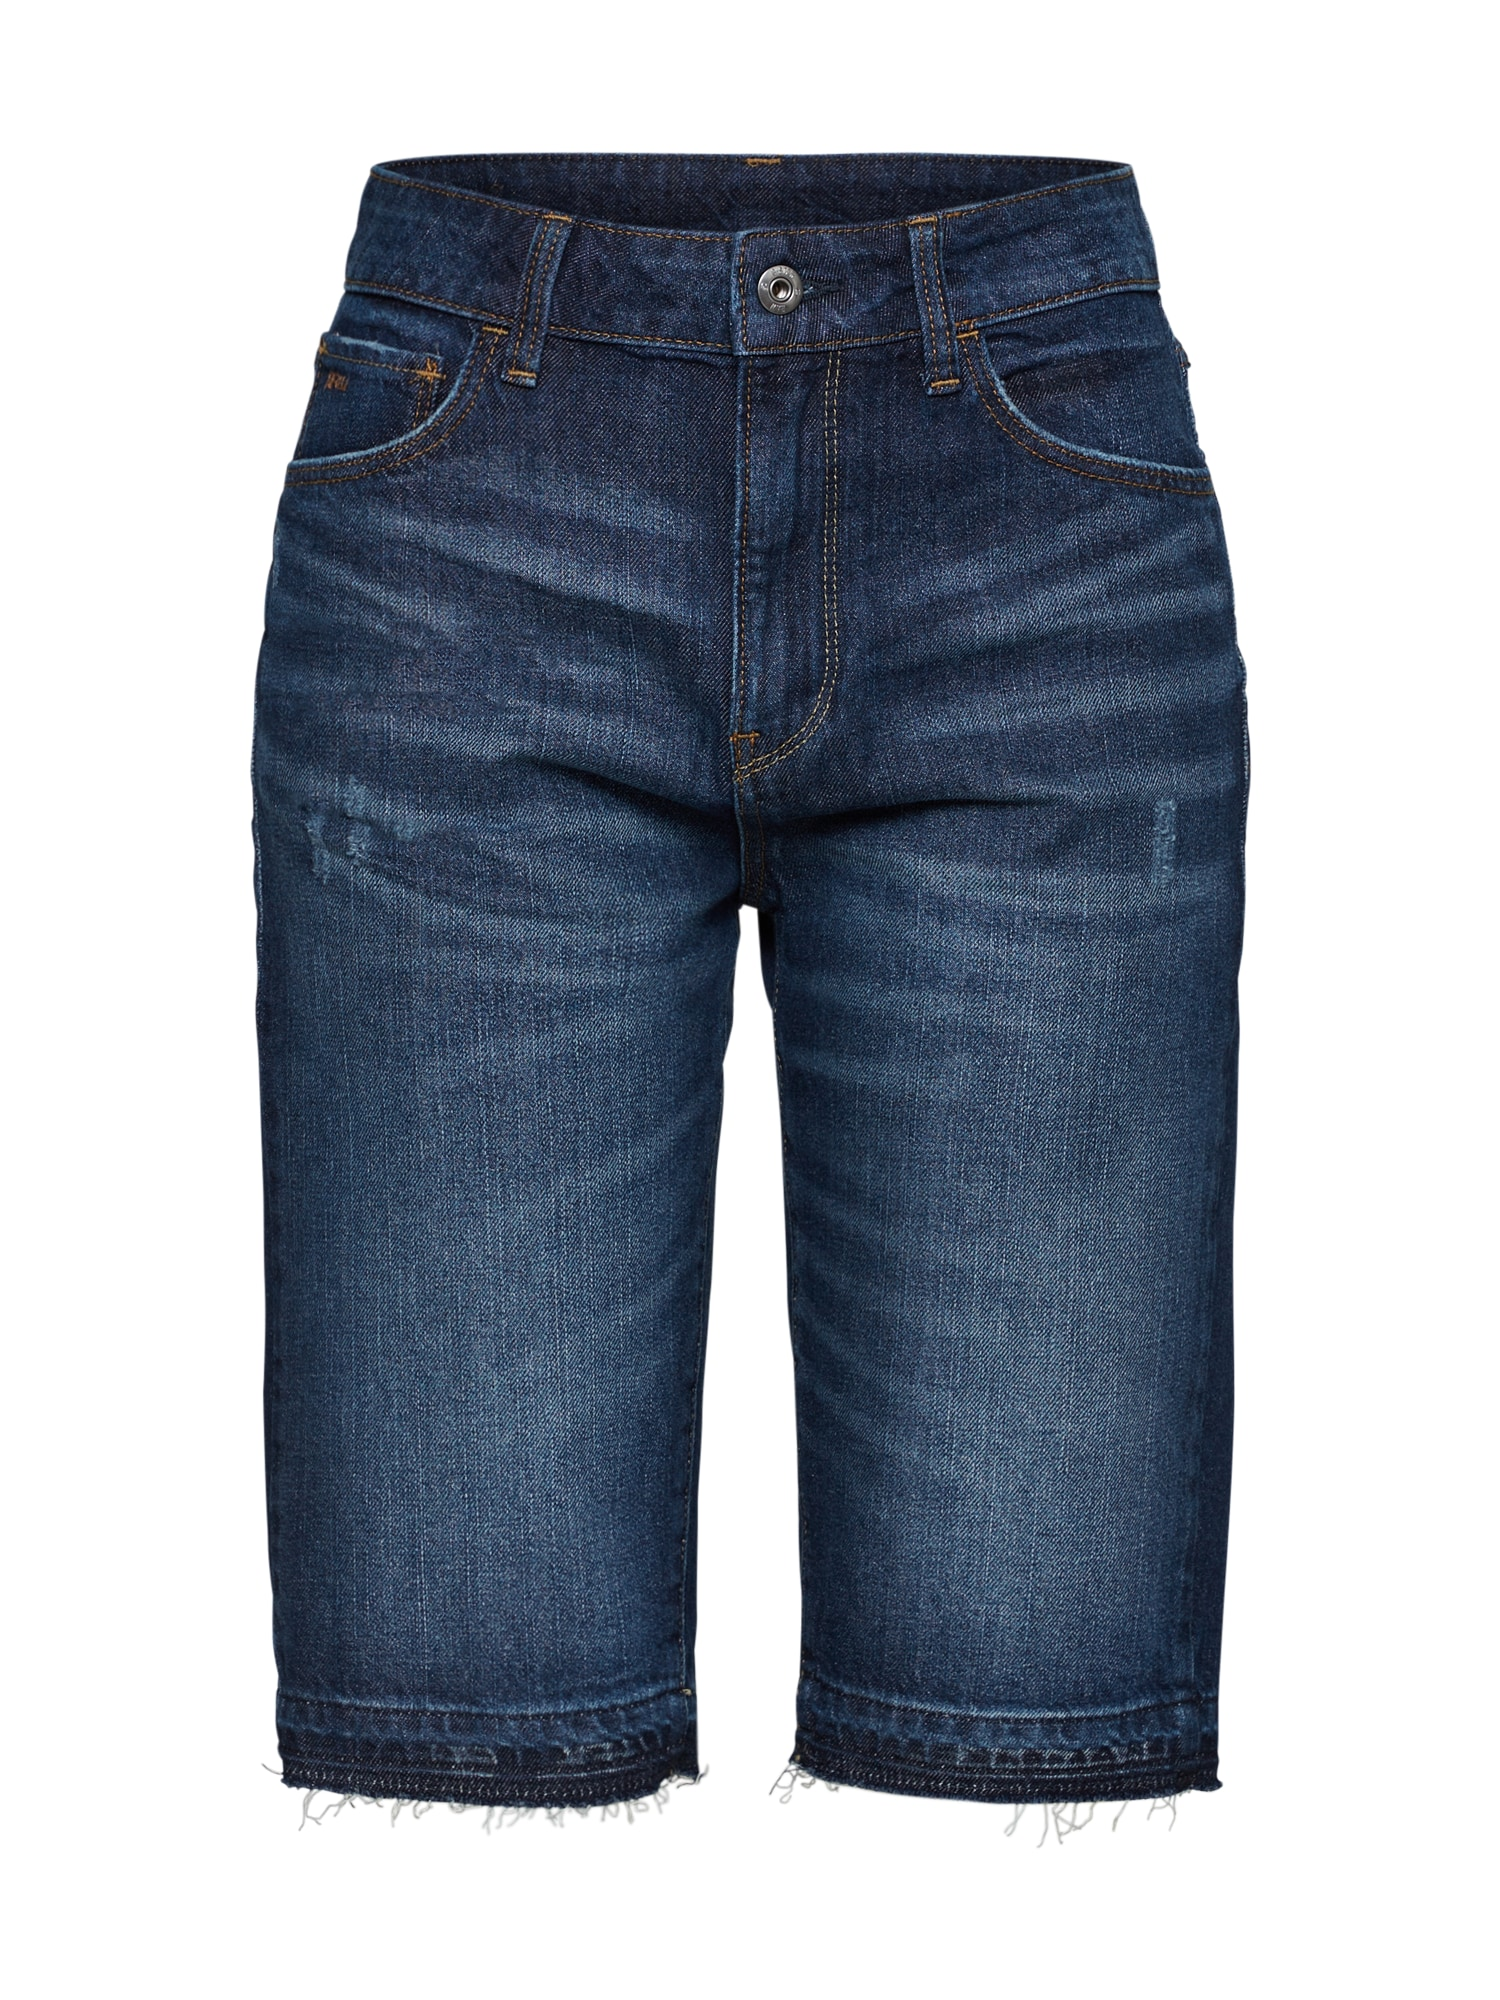 G-STAR RAW Dames Jeans 3301 High Straight Short rp Wmn blauw denim